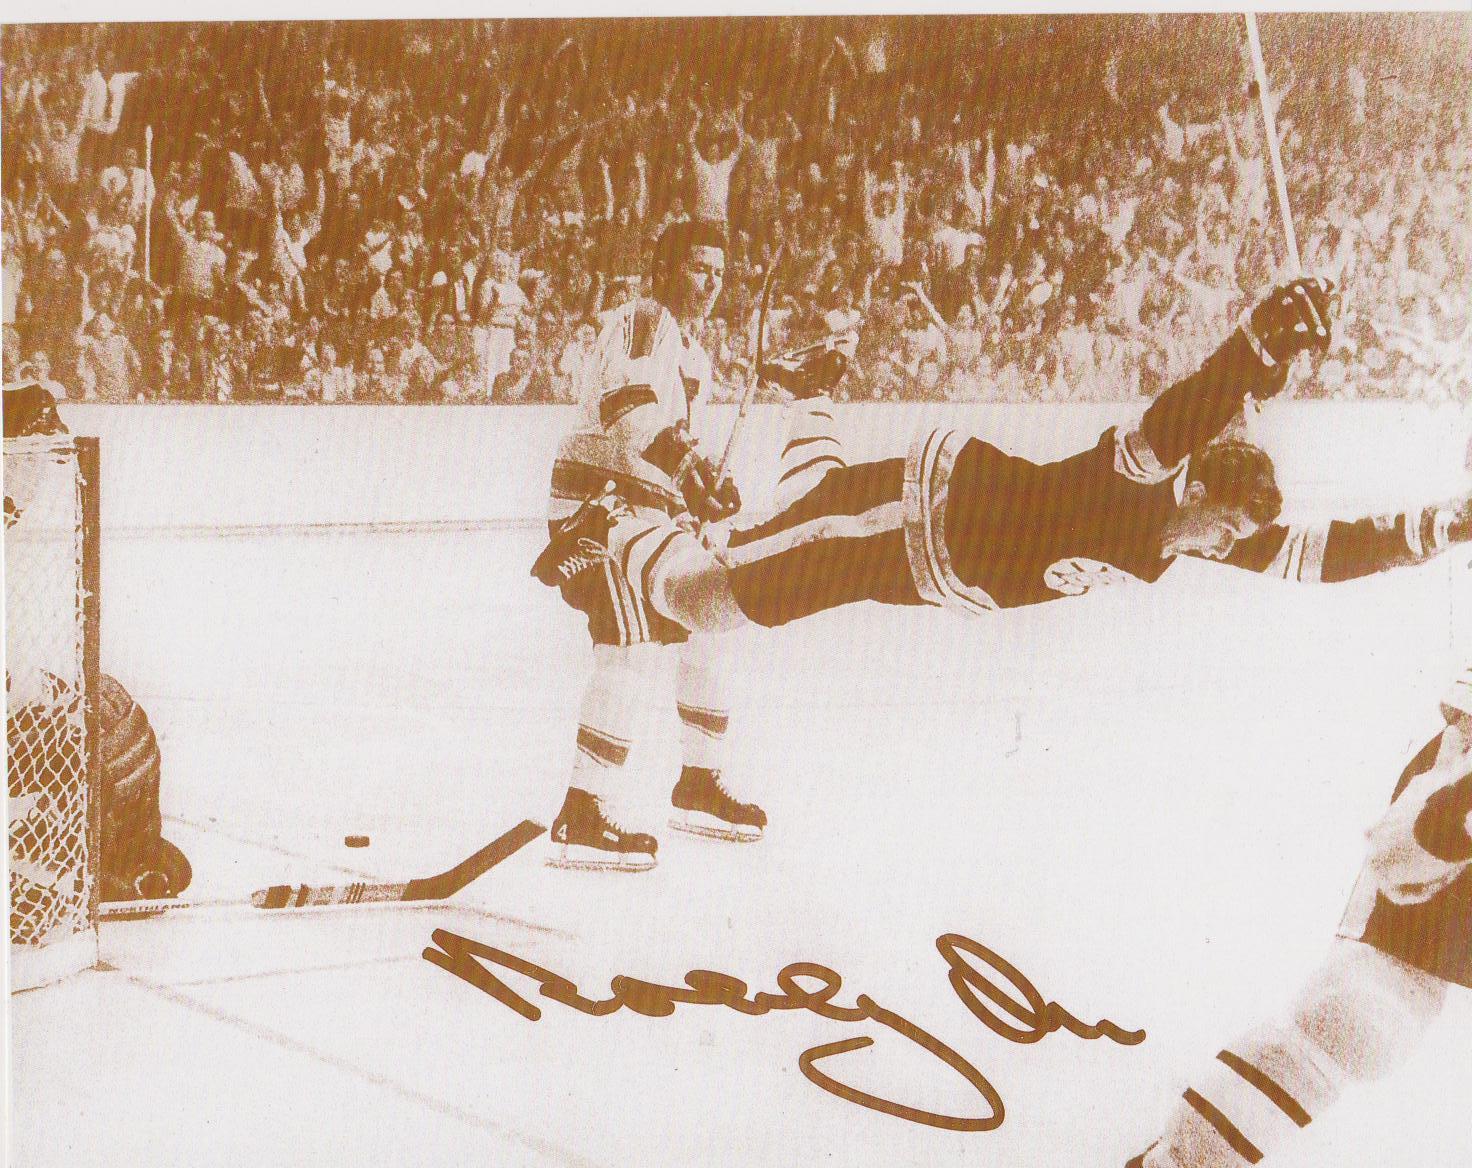 Bobby Orr Boston Bruins 05/10/70 Cup Winning Goal vs St Louis 8X10 Sepia Photo - $5.99